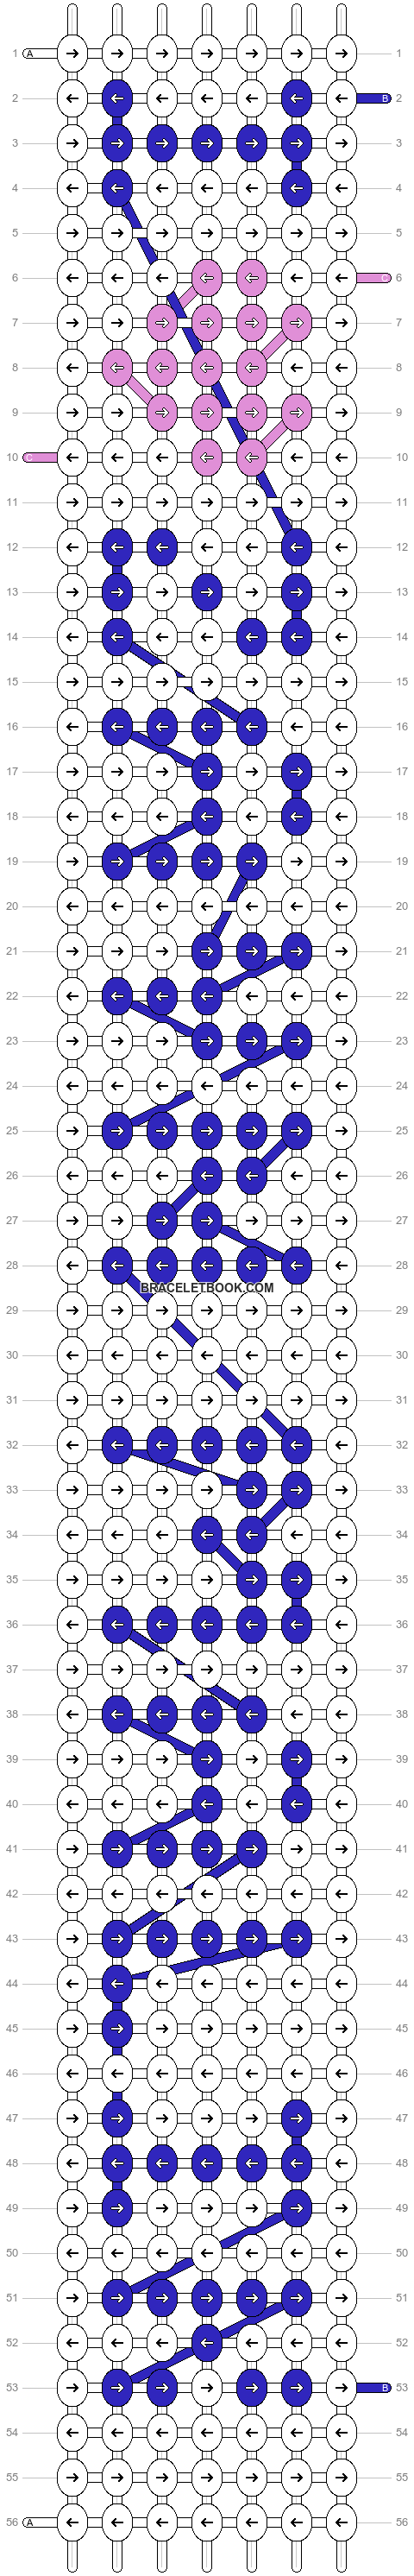 Alpha pattern #6290 pattern